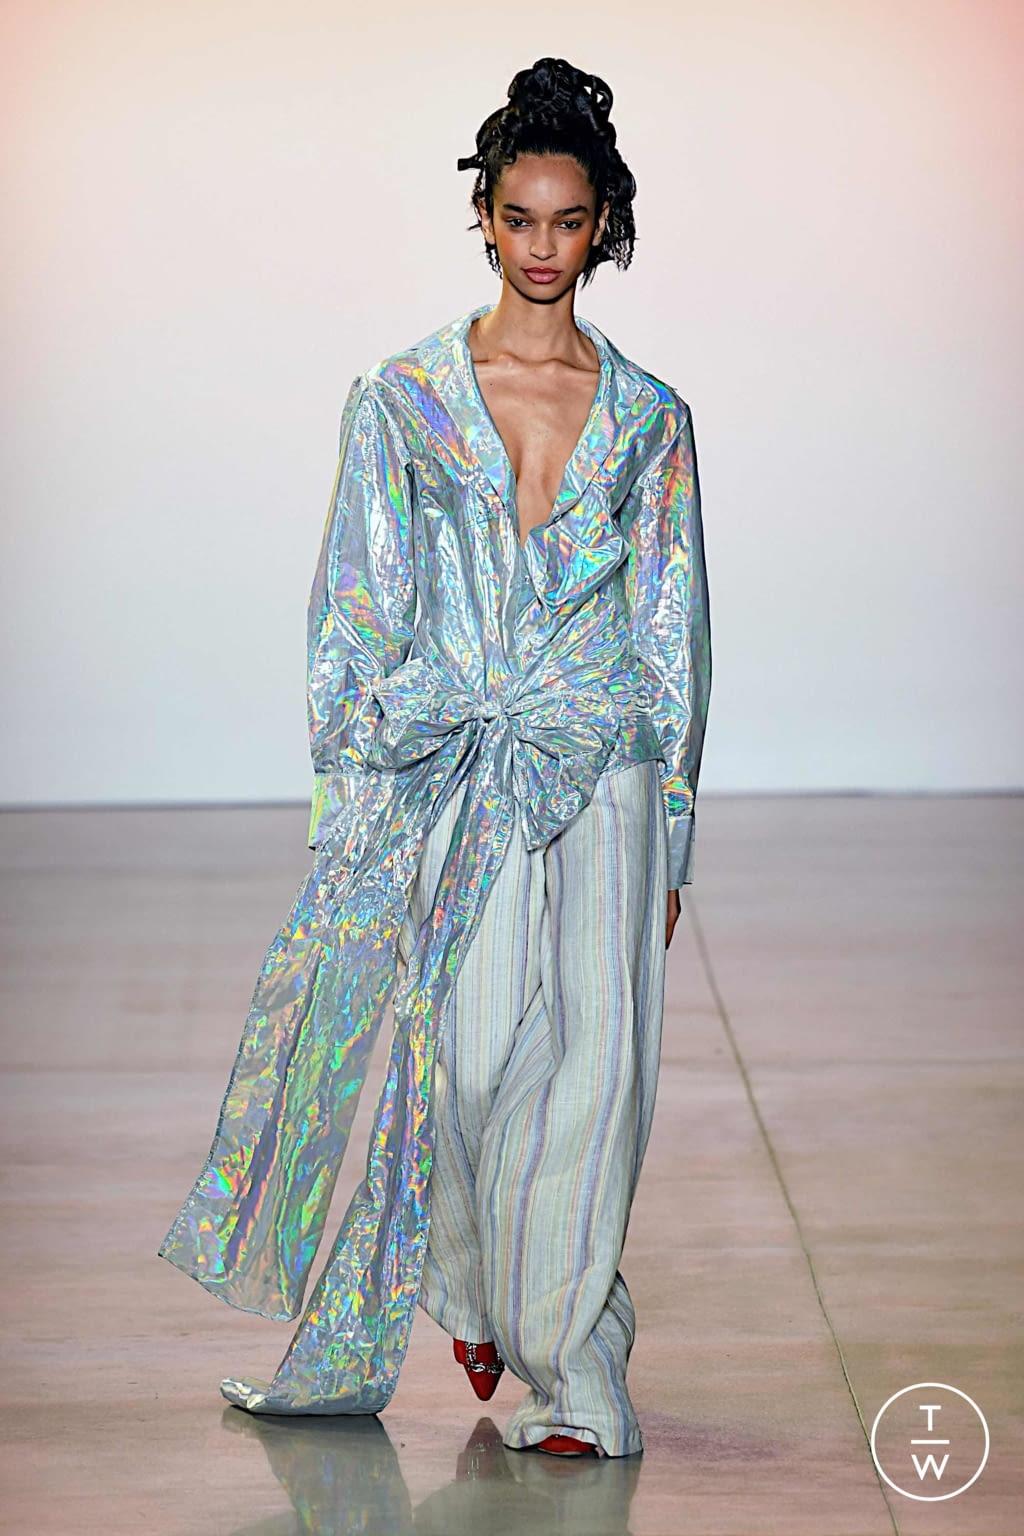 Fashion Week New York Spring/Summer 2020 look 16 de la collection Christopher John Rogers womenswear